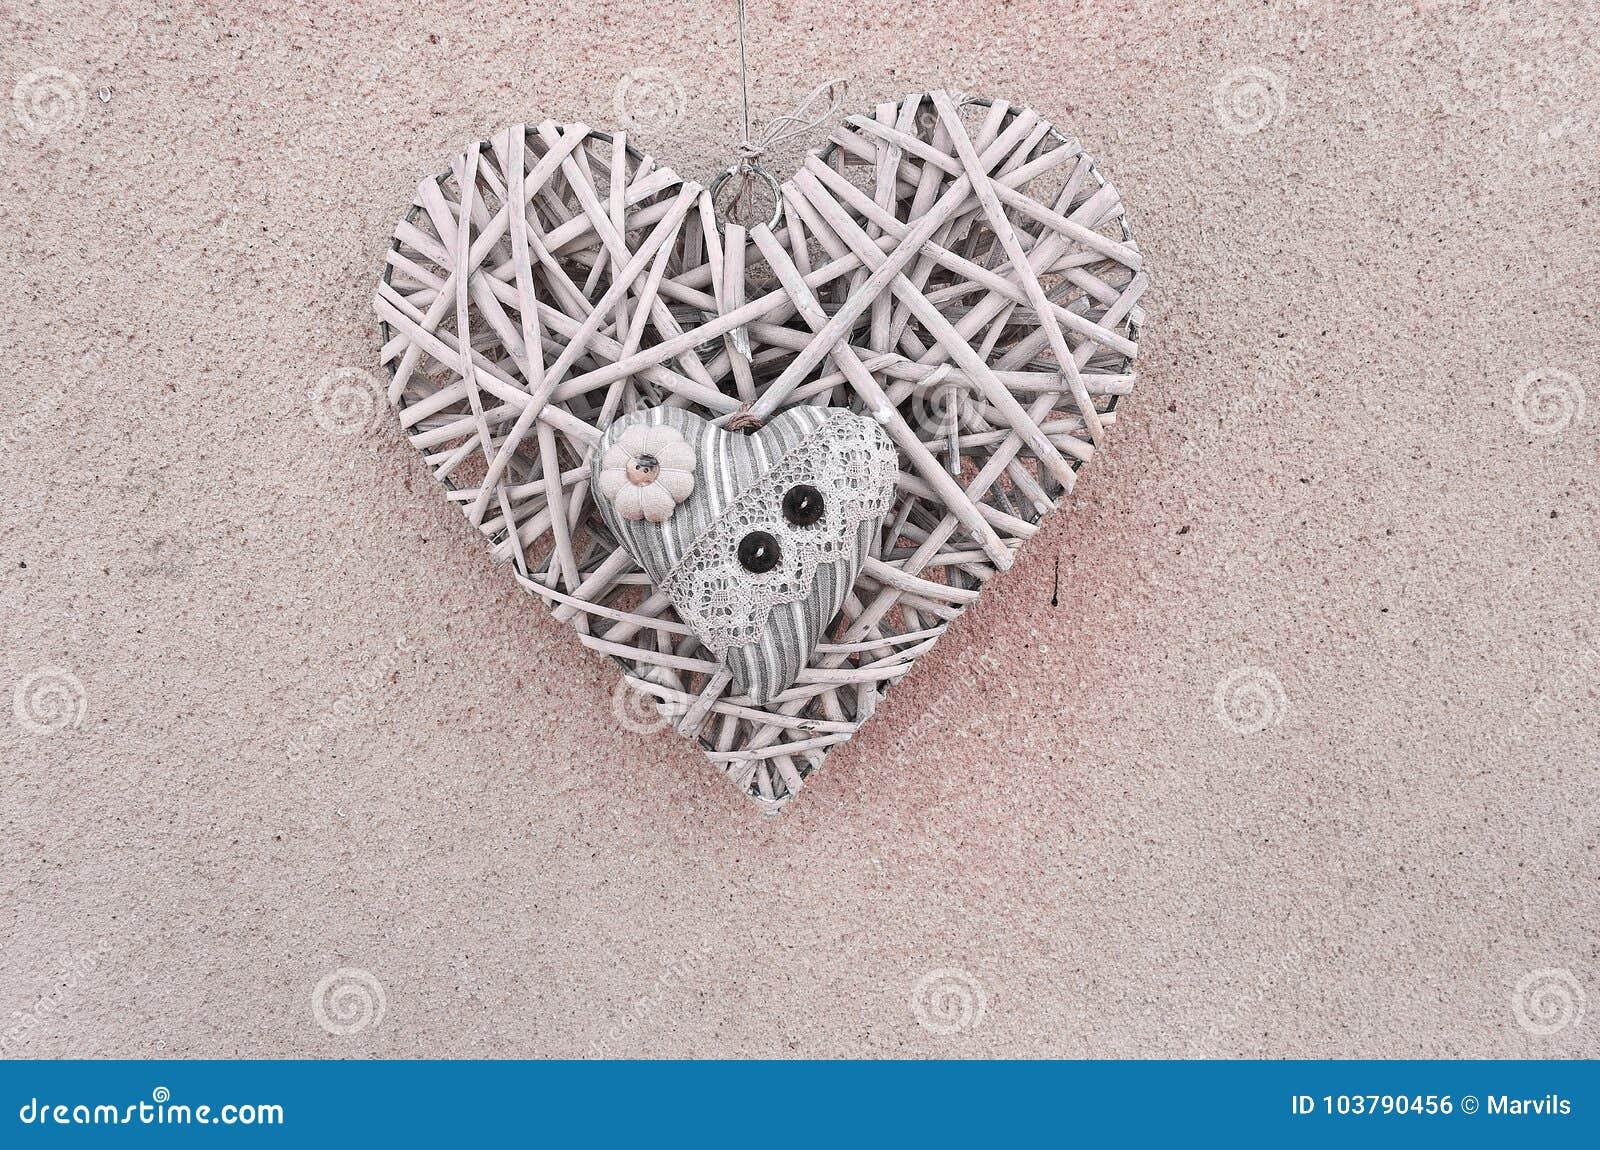 Herz zwei auf dem wall& x28; Valentine& x27; s-day& x29;